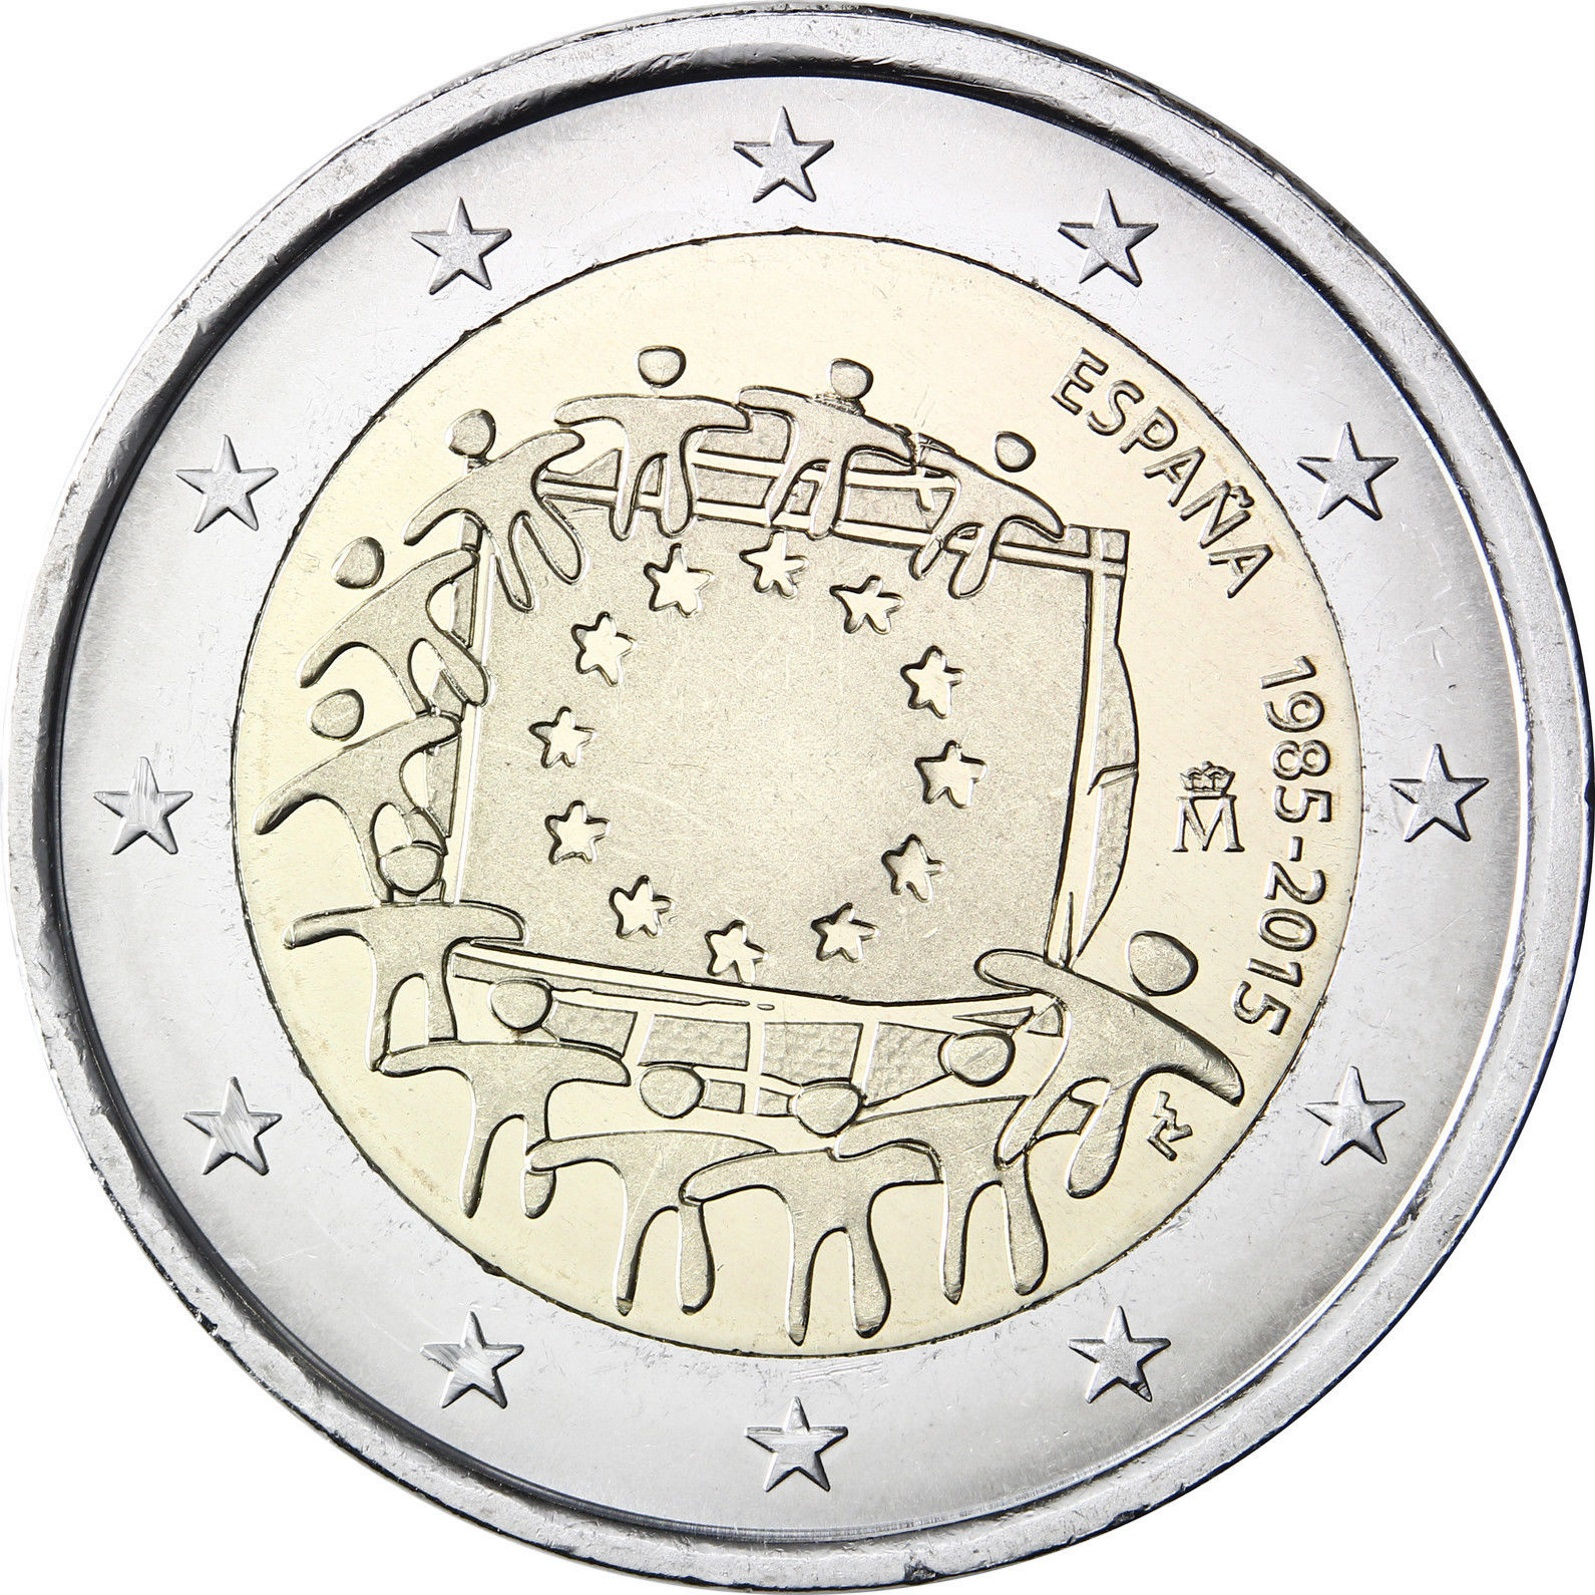 spain 2 euro 2015 30th anniversary of the eu flag eur30446